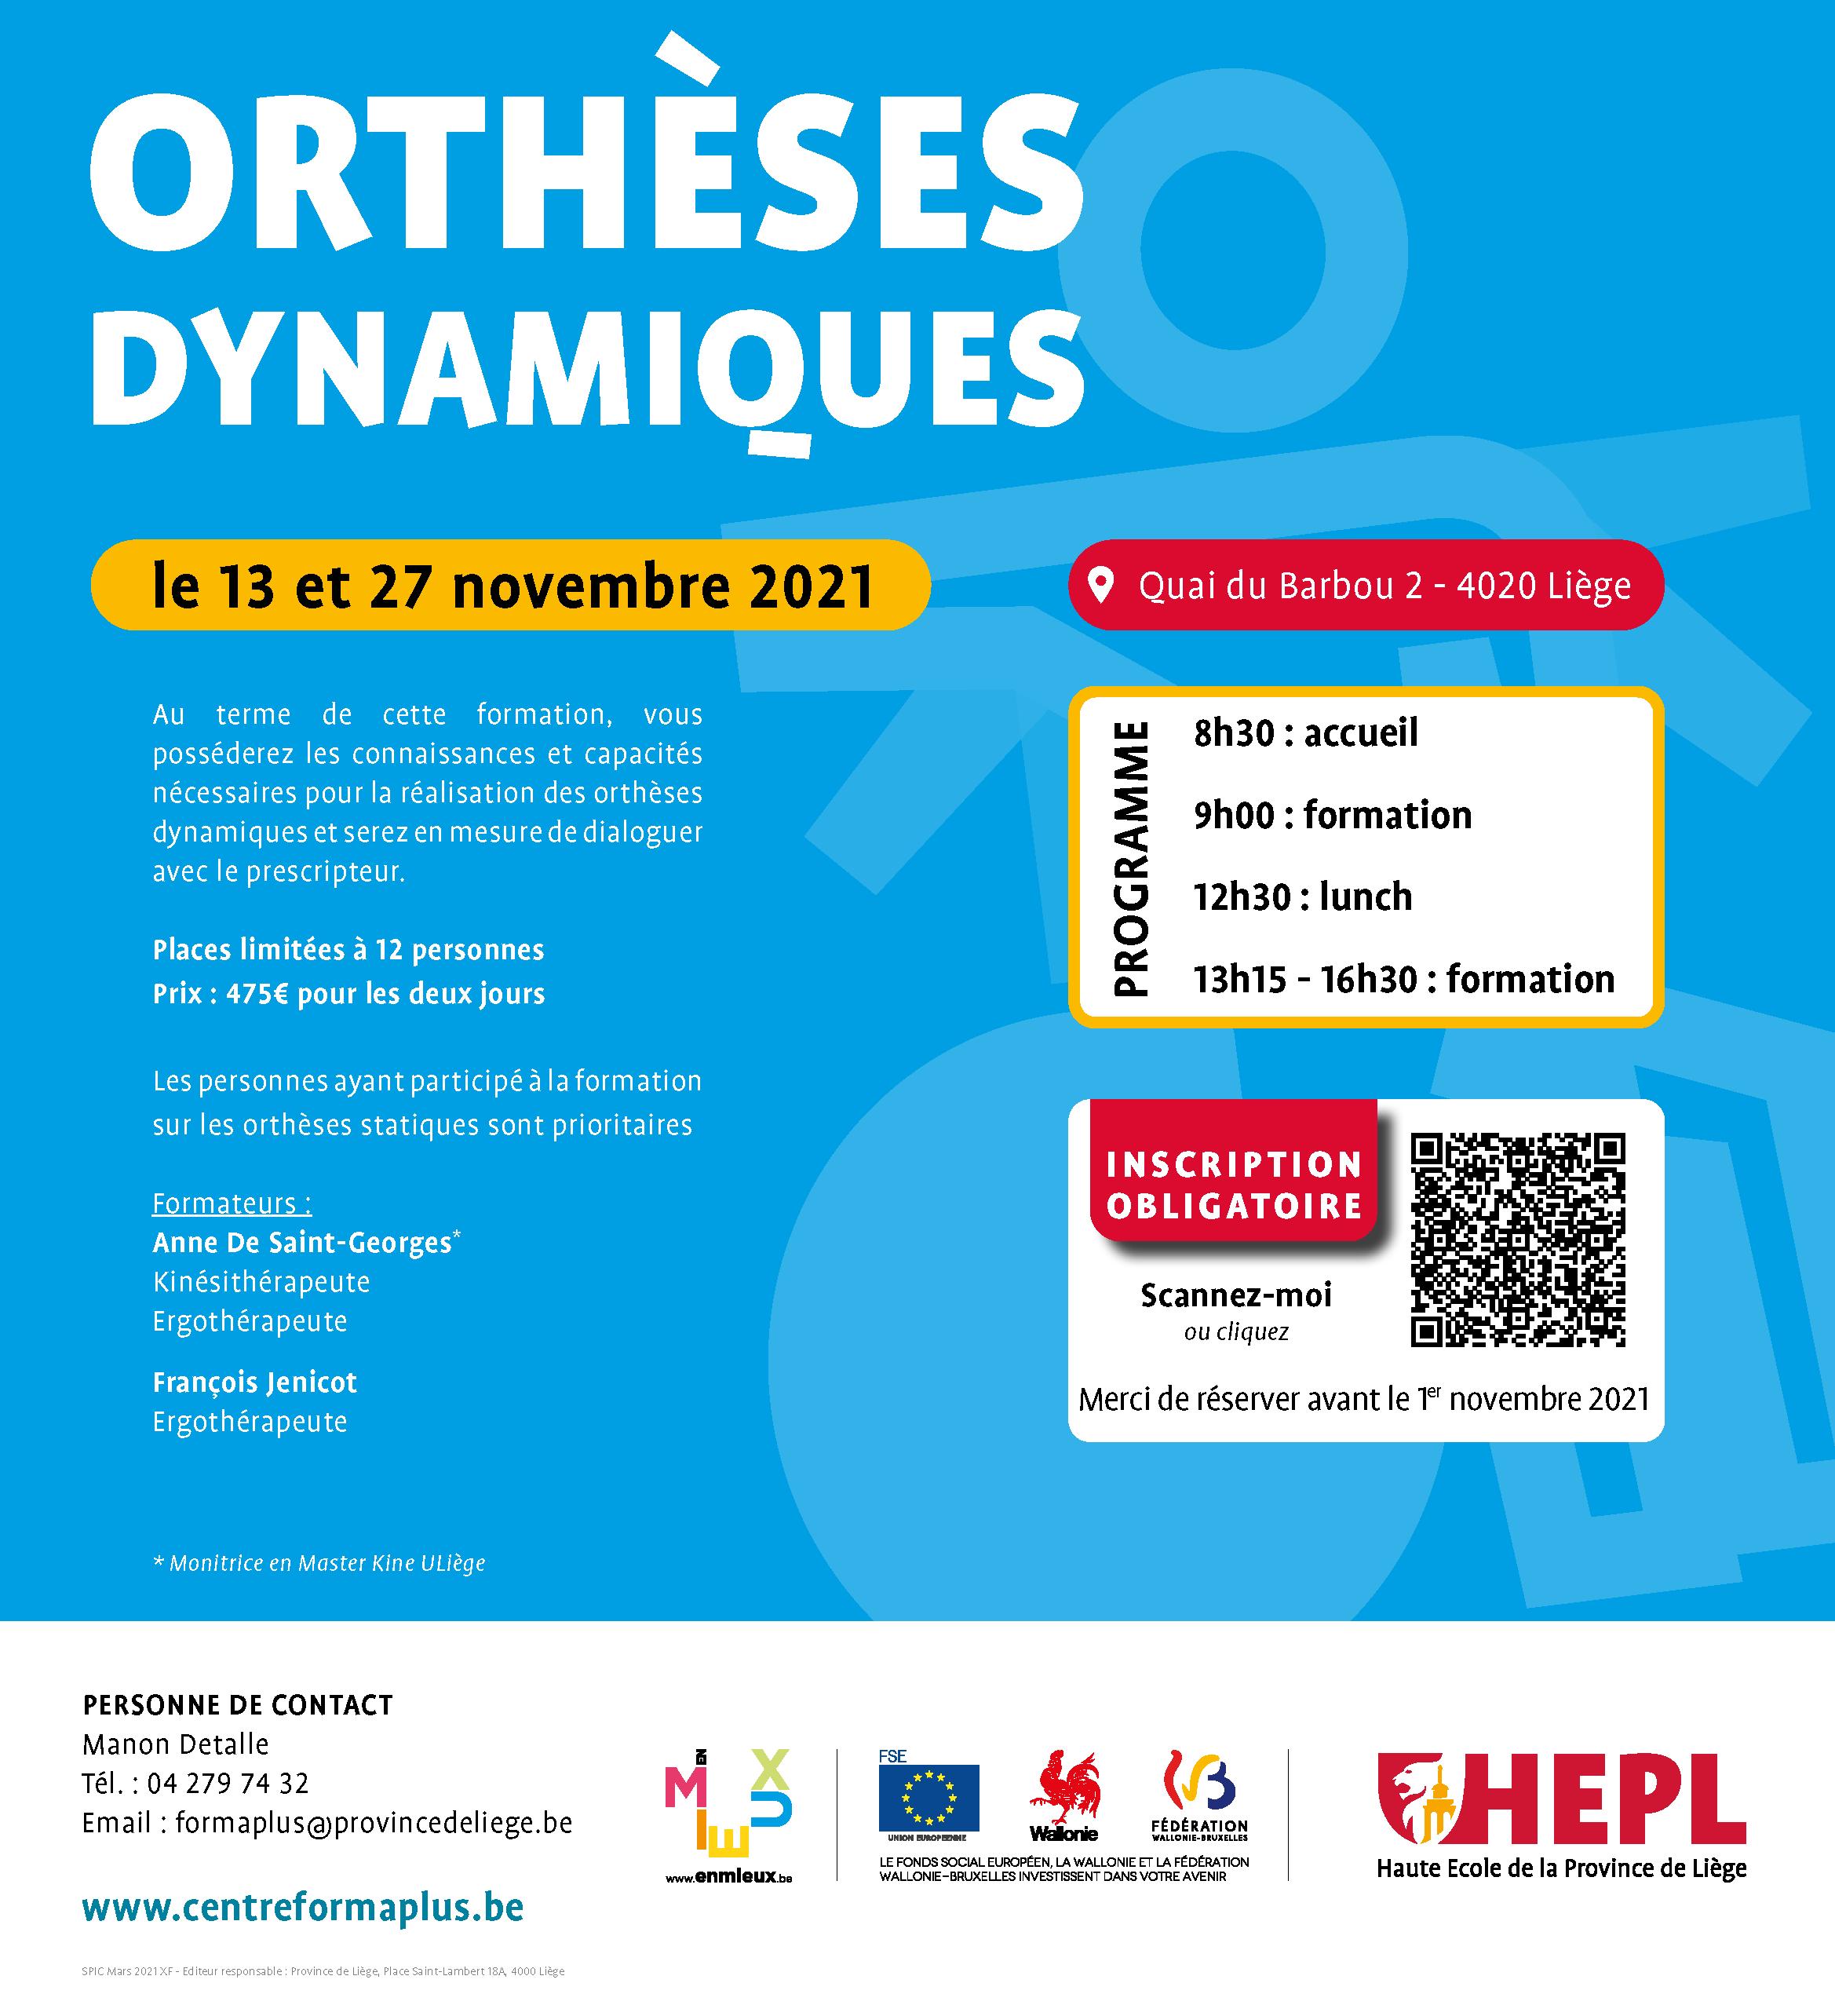 HEPL Formation Othèses Dynamiques 2021